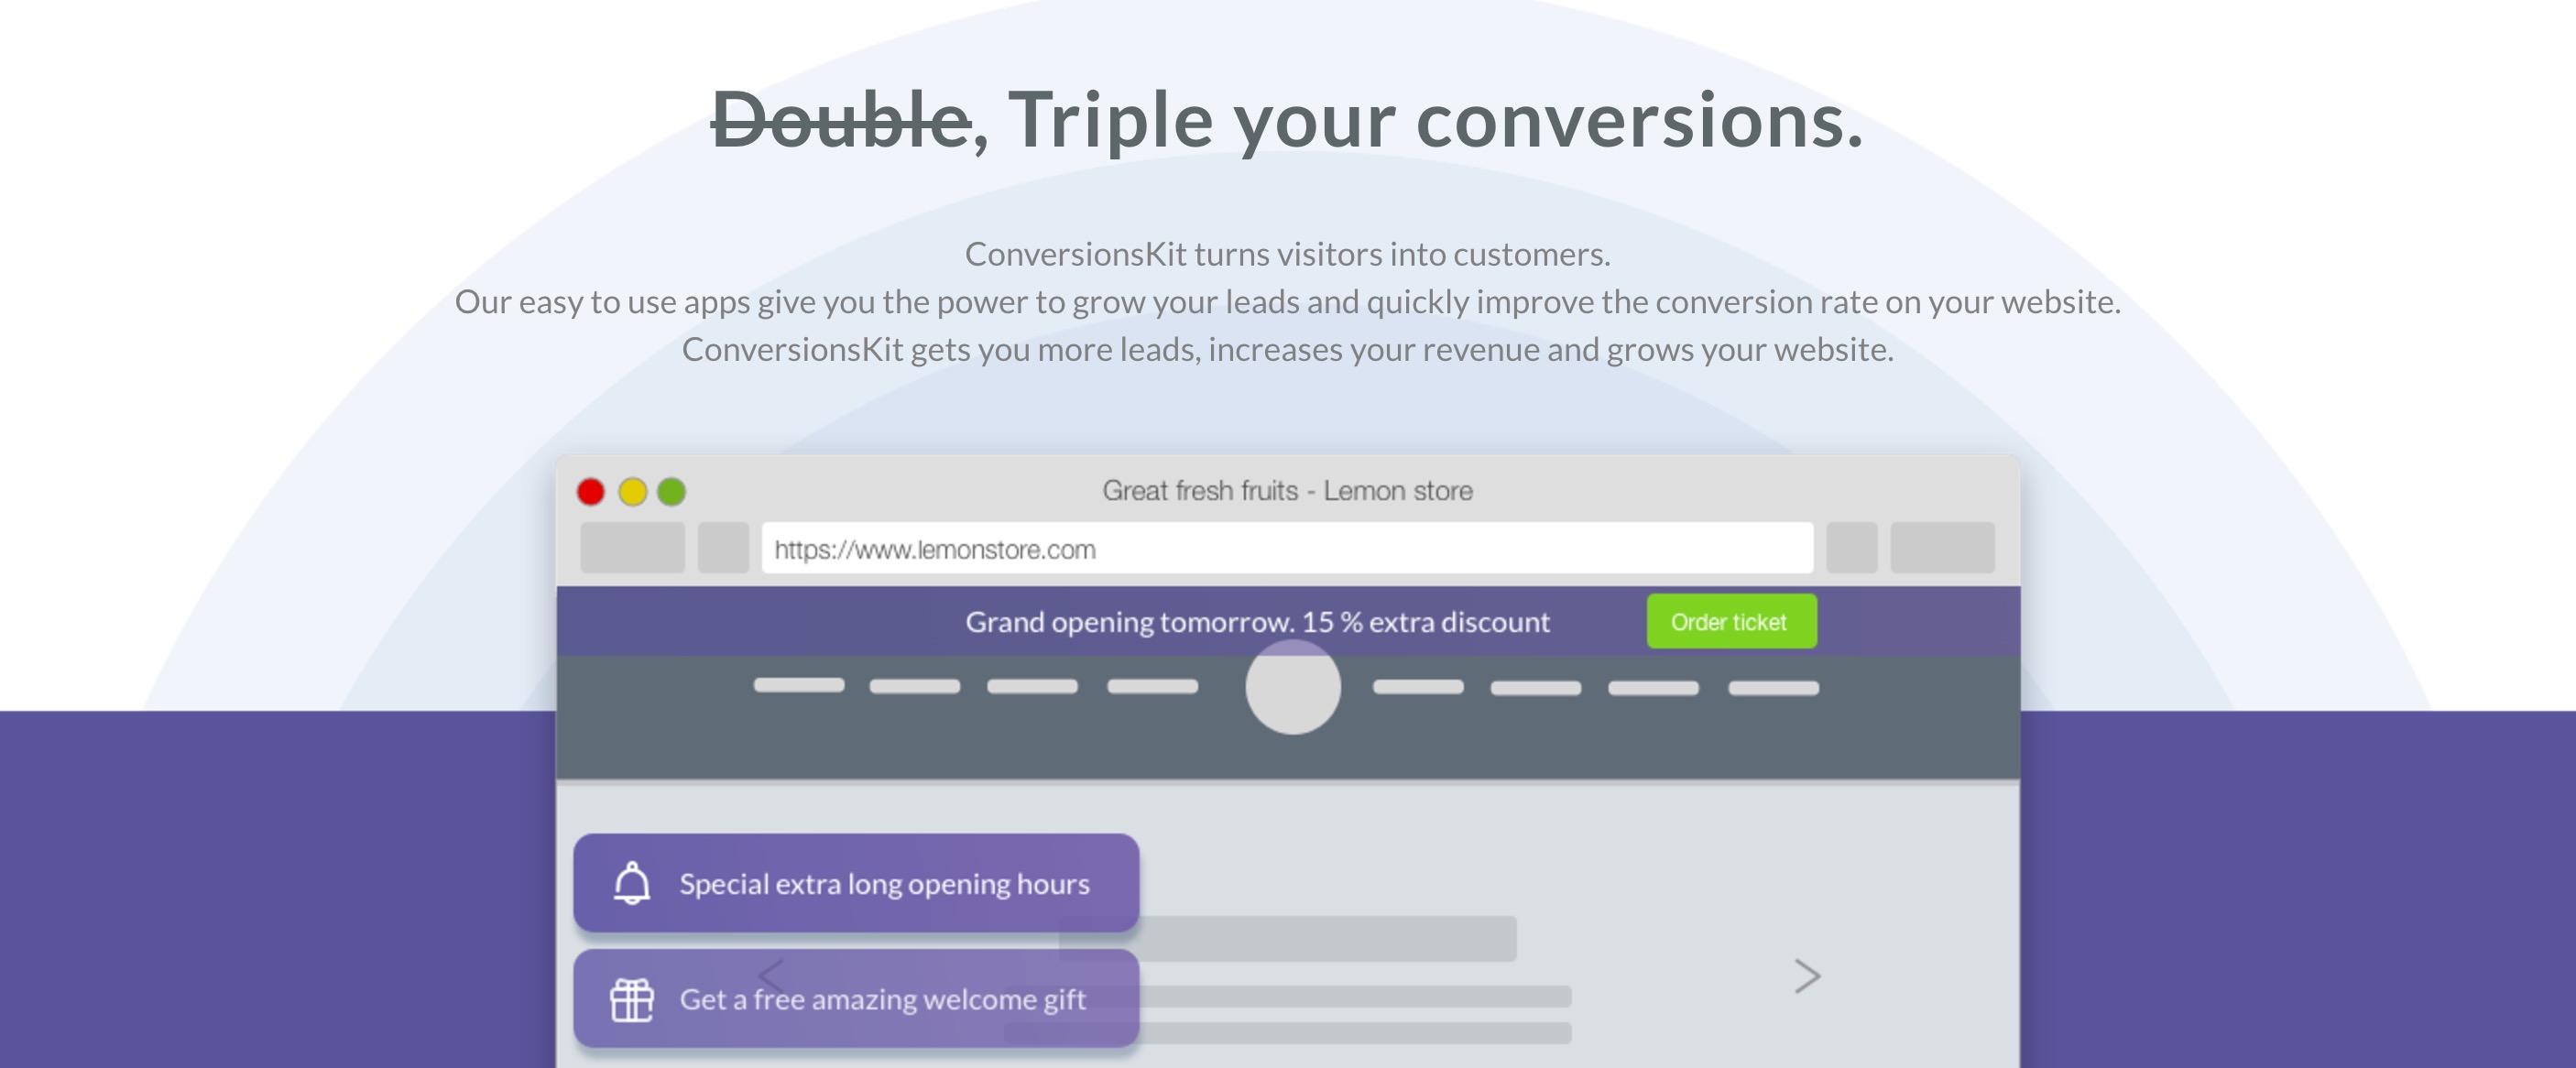 Conversion Principles Screenshot - conversion centered design